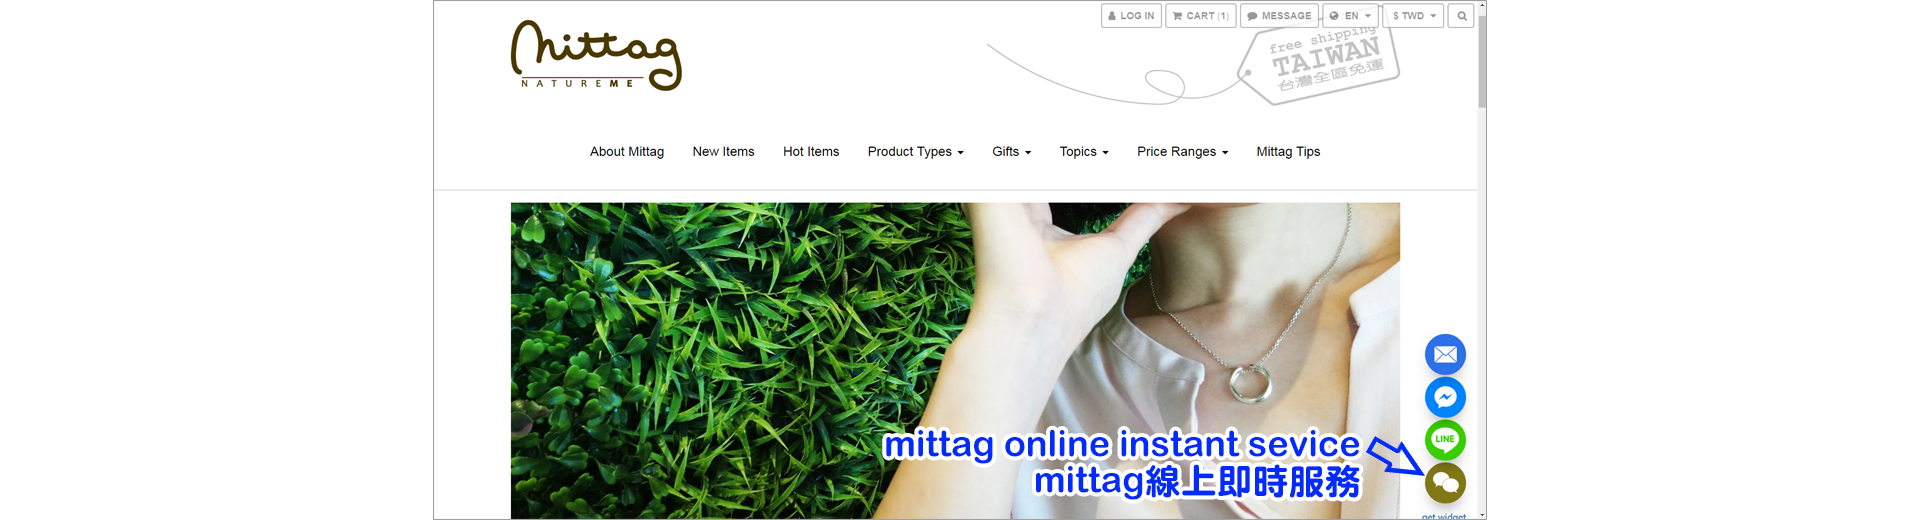 mittag銀飾官網每頁的右下方的線上即時服務,我們會有專人立即與您服務